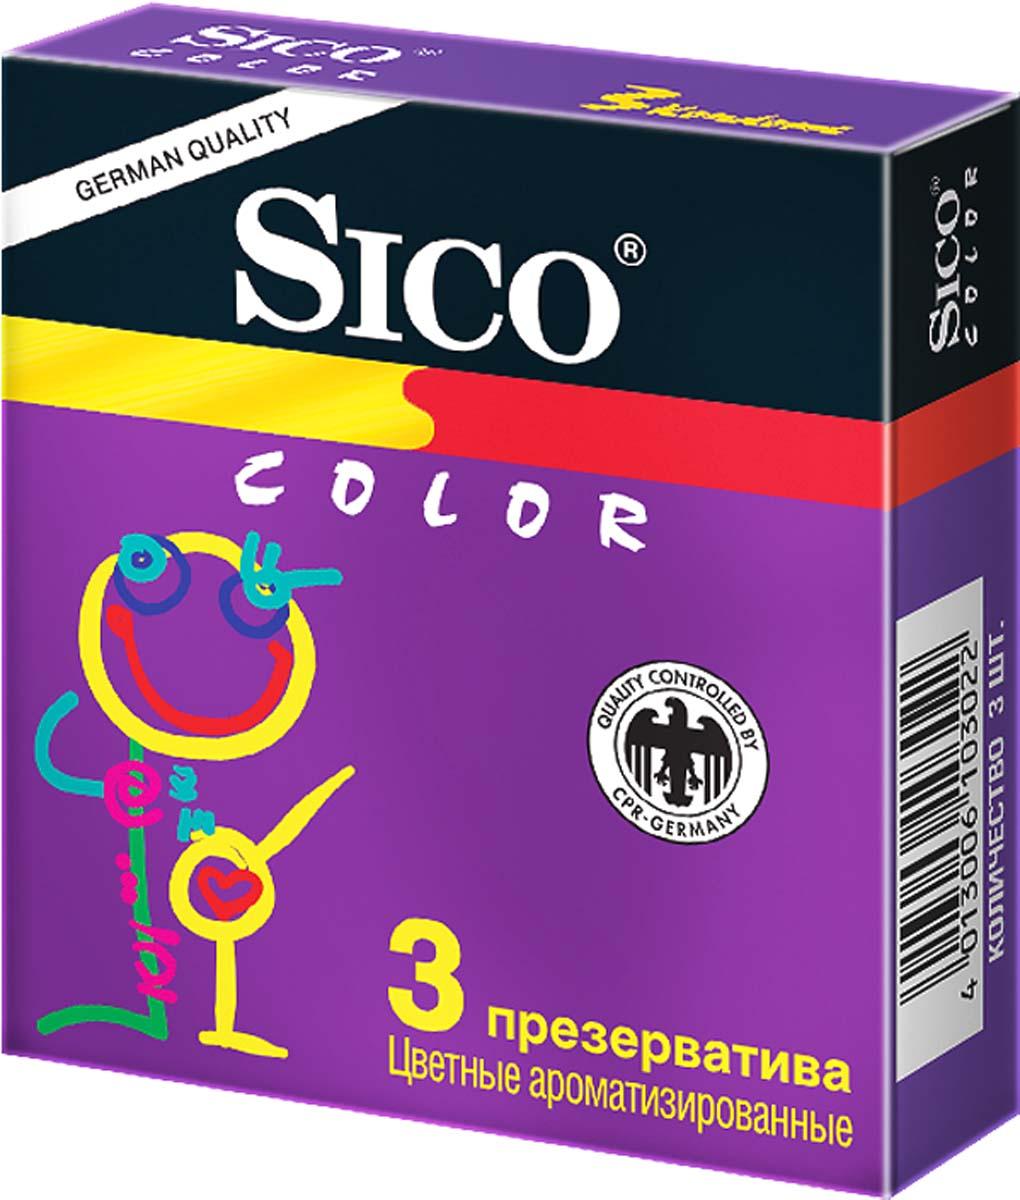 SICO Презервативы Color, цветные ароматизированные, 3 шт demoniq with love sophie pink set